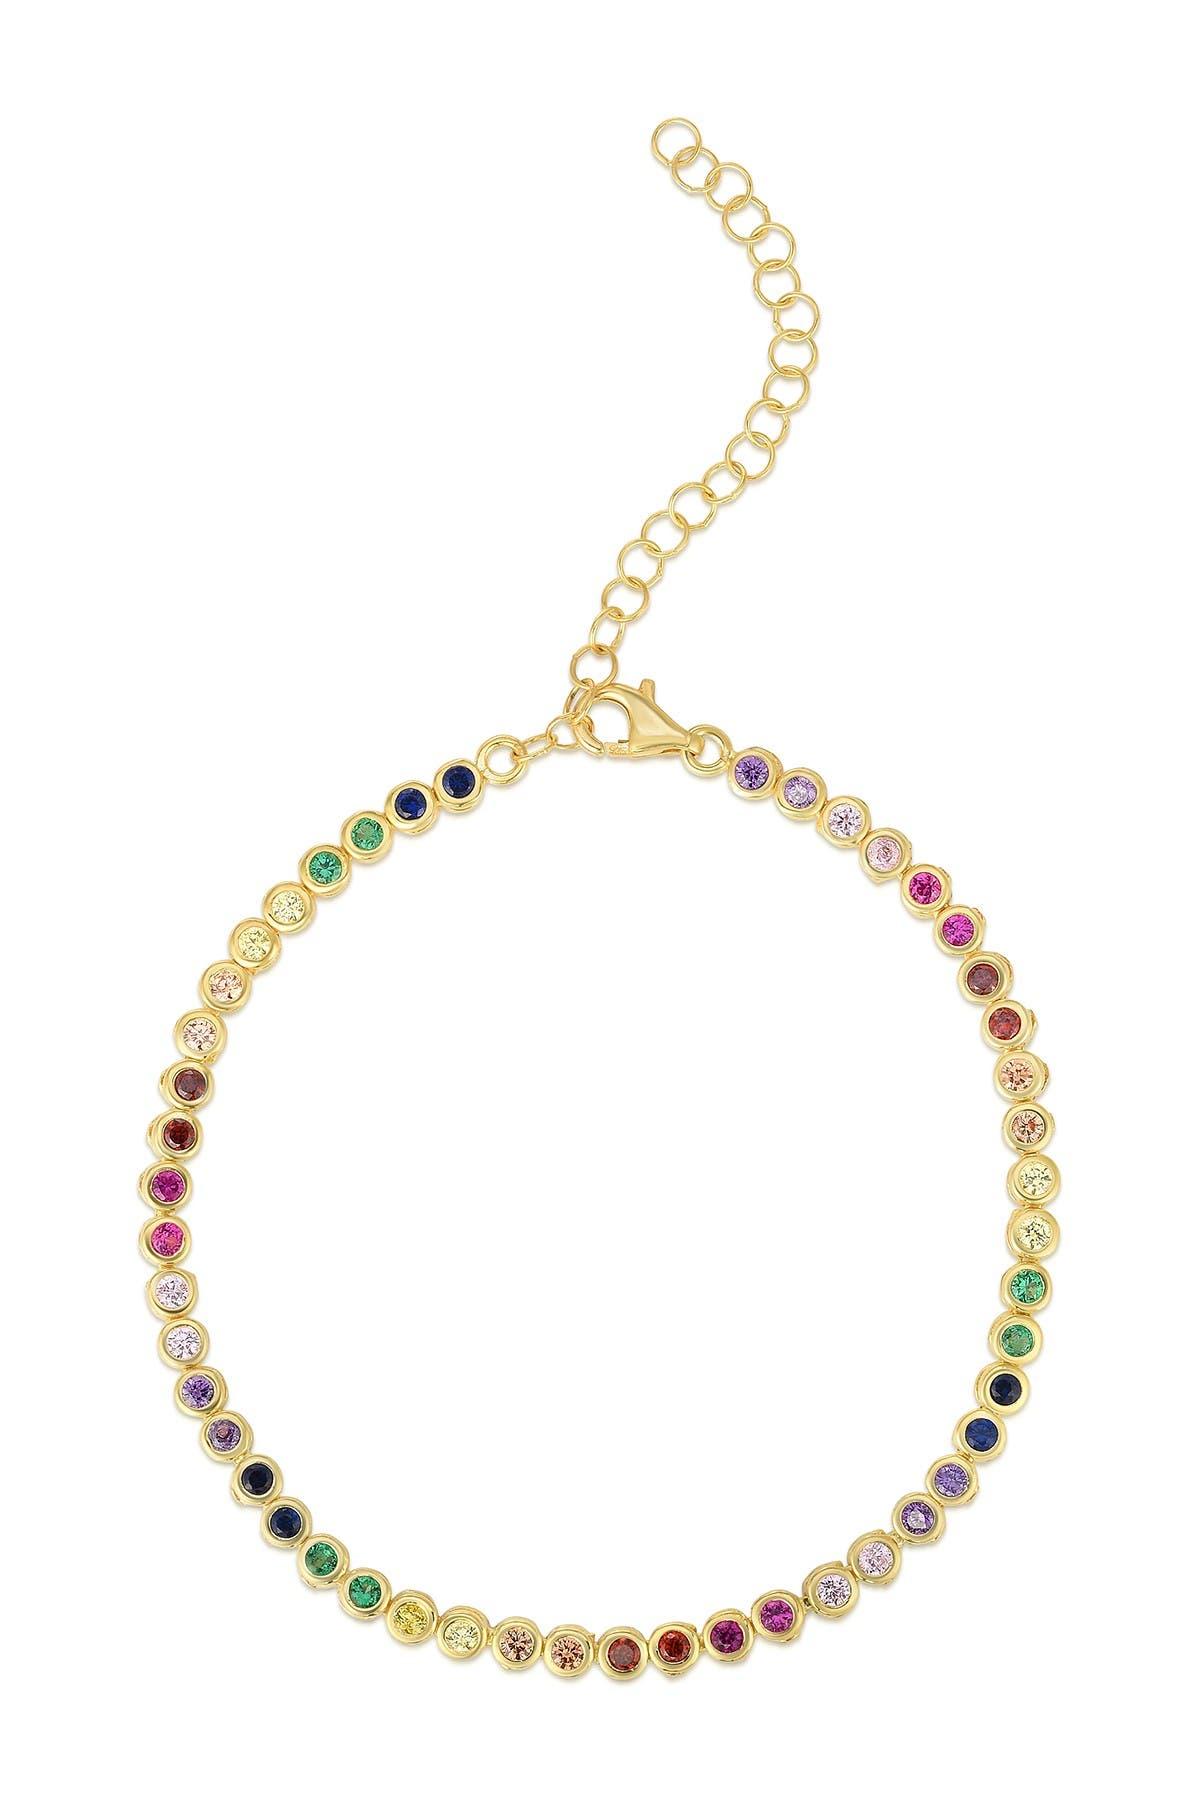 Image of Sphera Milano 14K Gold Plated Sterling Silver Rainbow CZ Tennis Bracelet